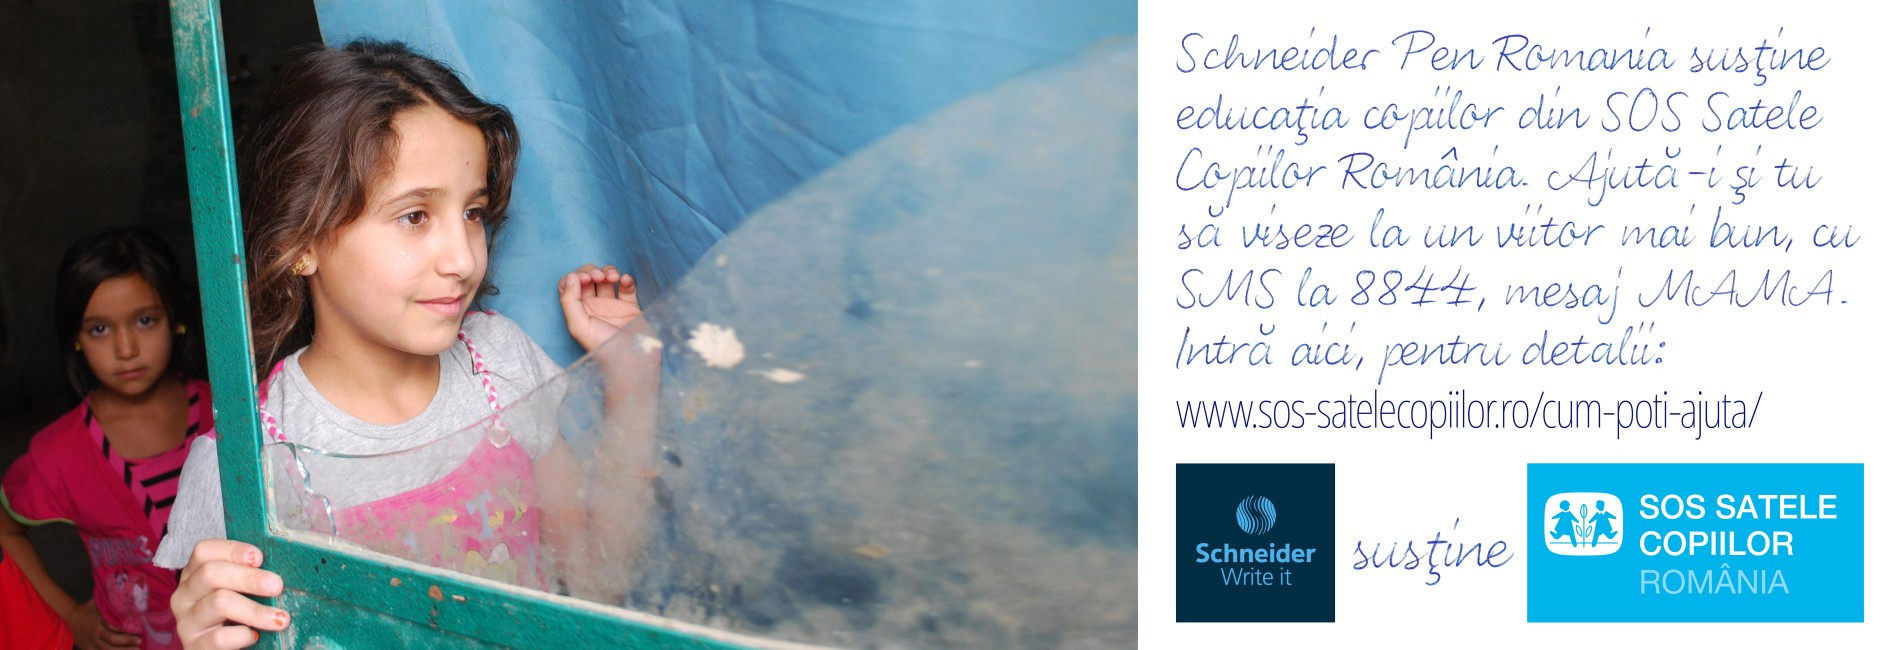 Schneider susține SOS Satele Copiilor